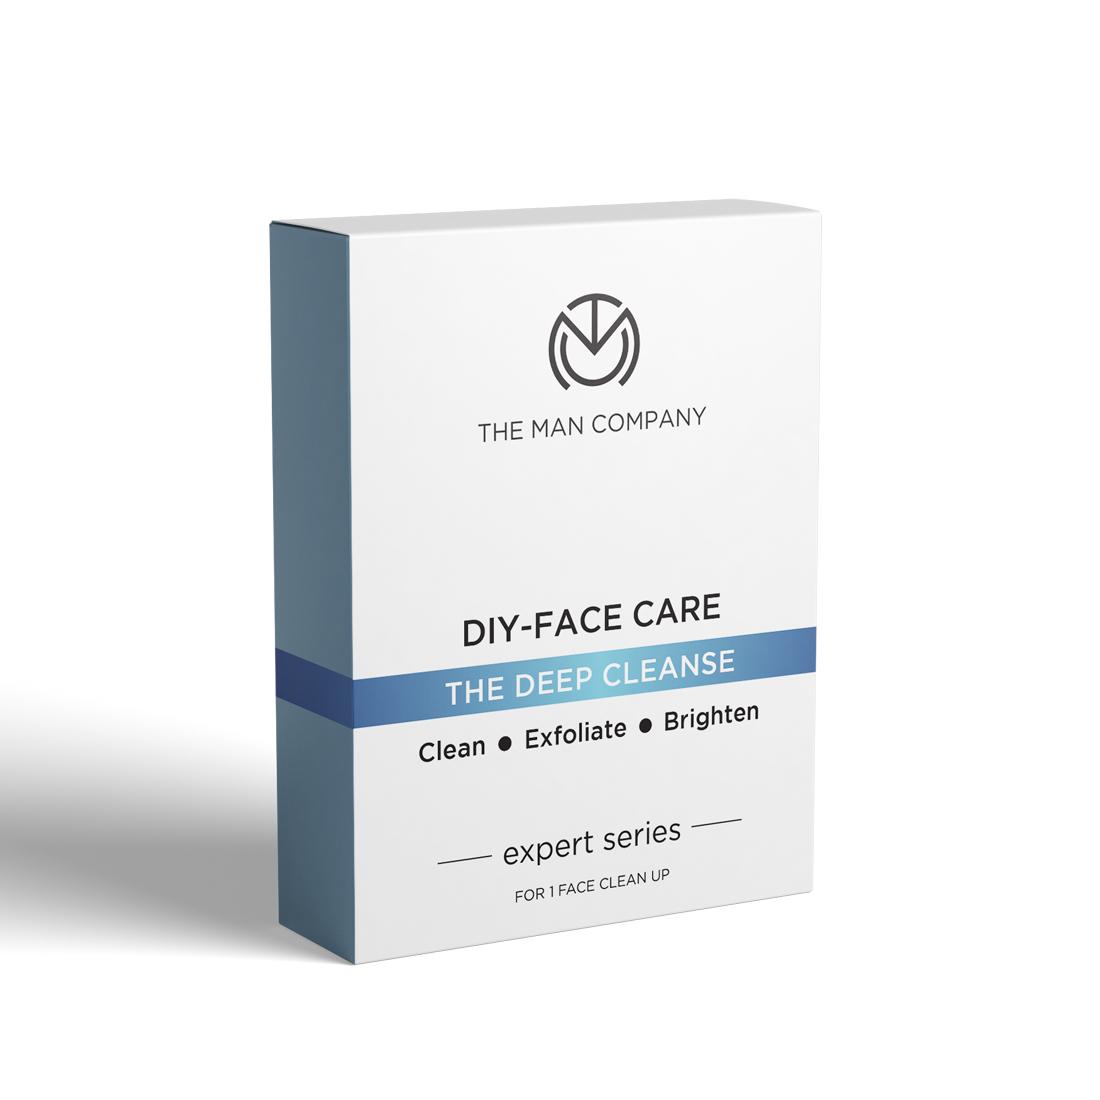 The Man Company | The Man Company DIY- Face Care Deep Cleanse (moisturising cream 2.5 g, cleansing gel 5gm, scrub 5 gm, peel off mask 15 gm, brightening cream 2.5 g)